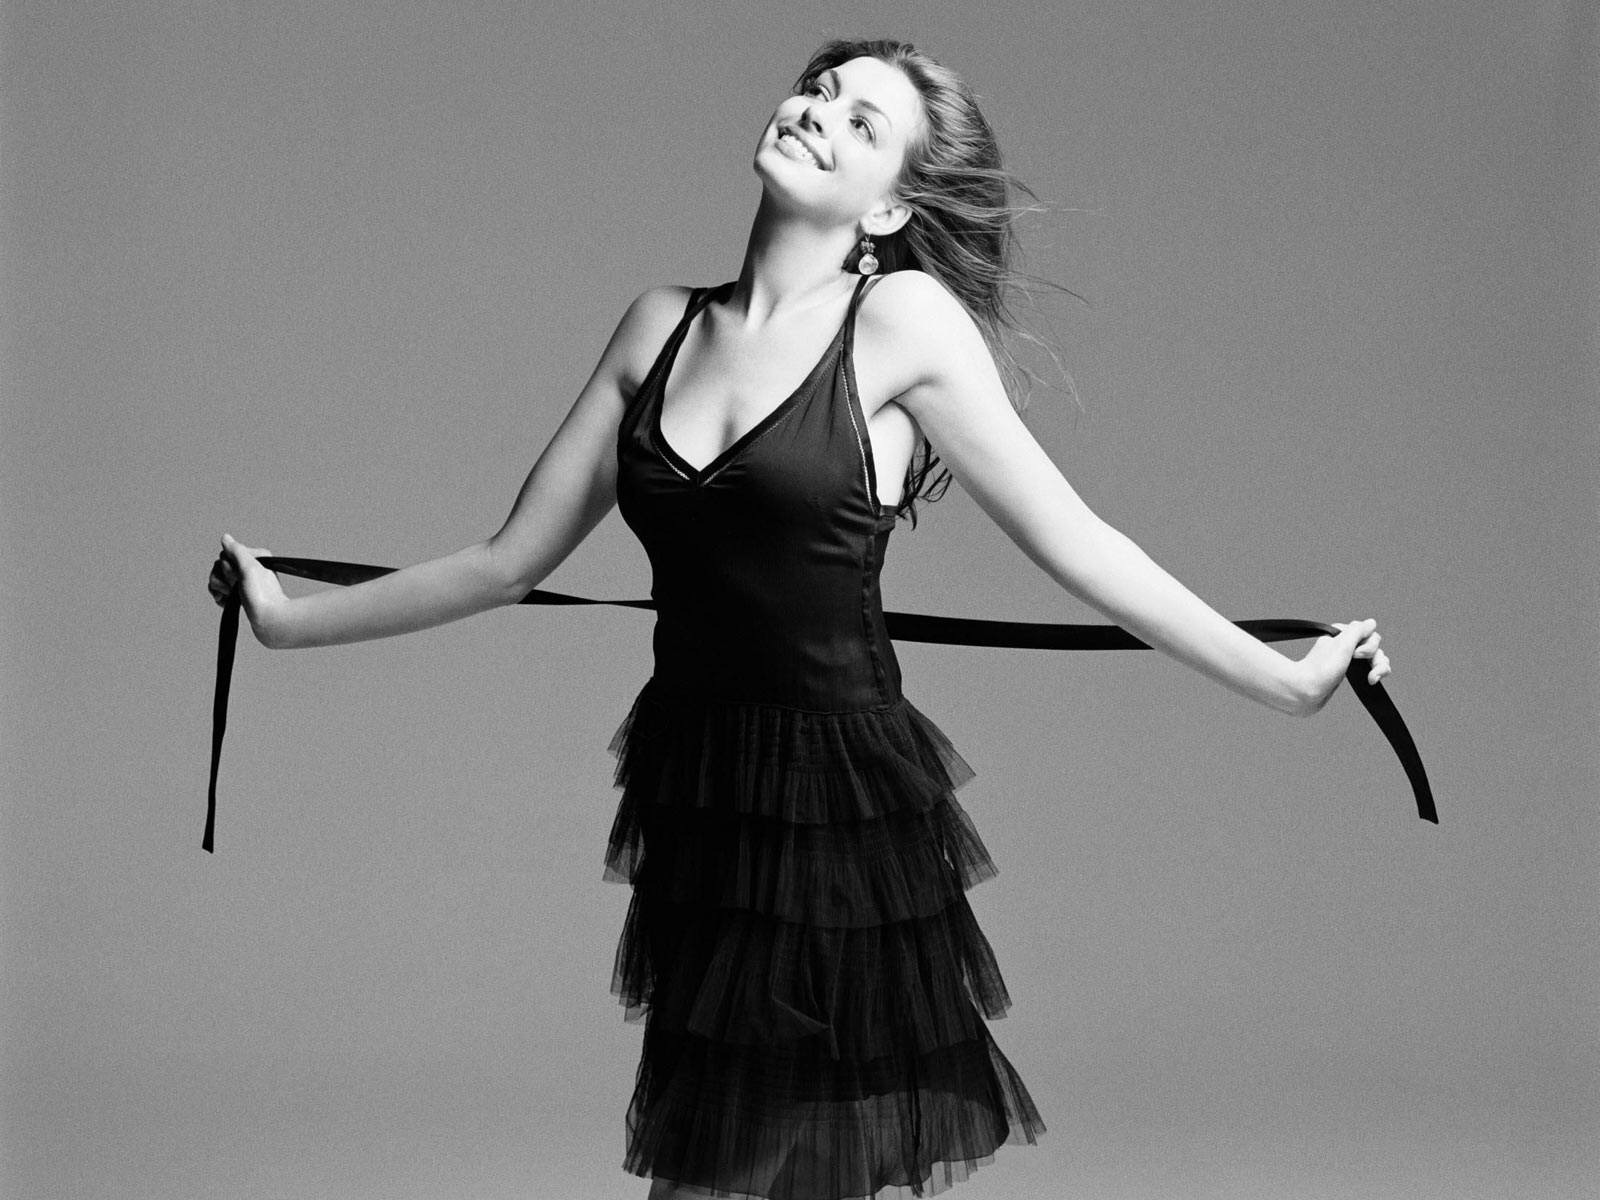 http://2.bp.blogspot.com/-TXQw64p2sWQ/UFcFuhFPEDI/AAAAAAAAAGw/h_xTbcCHocc/s1600/Anne+Hathaway+new+hot+pic+2012+03.jpg